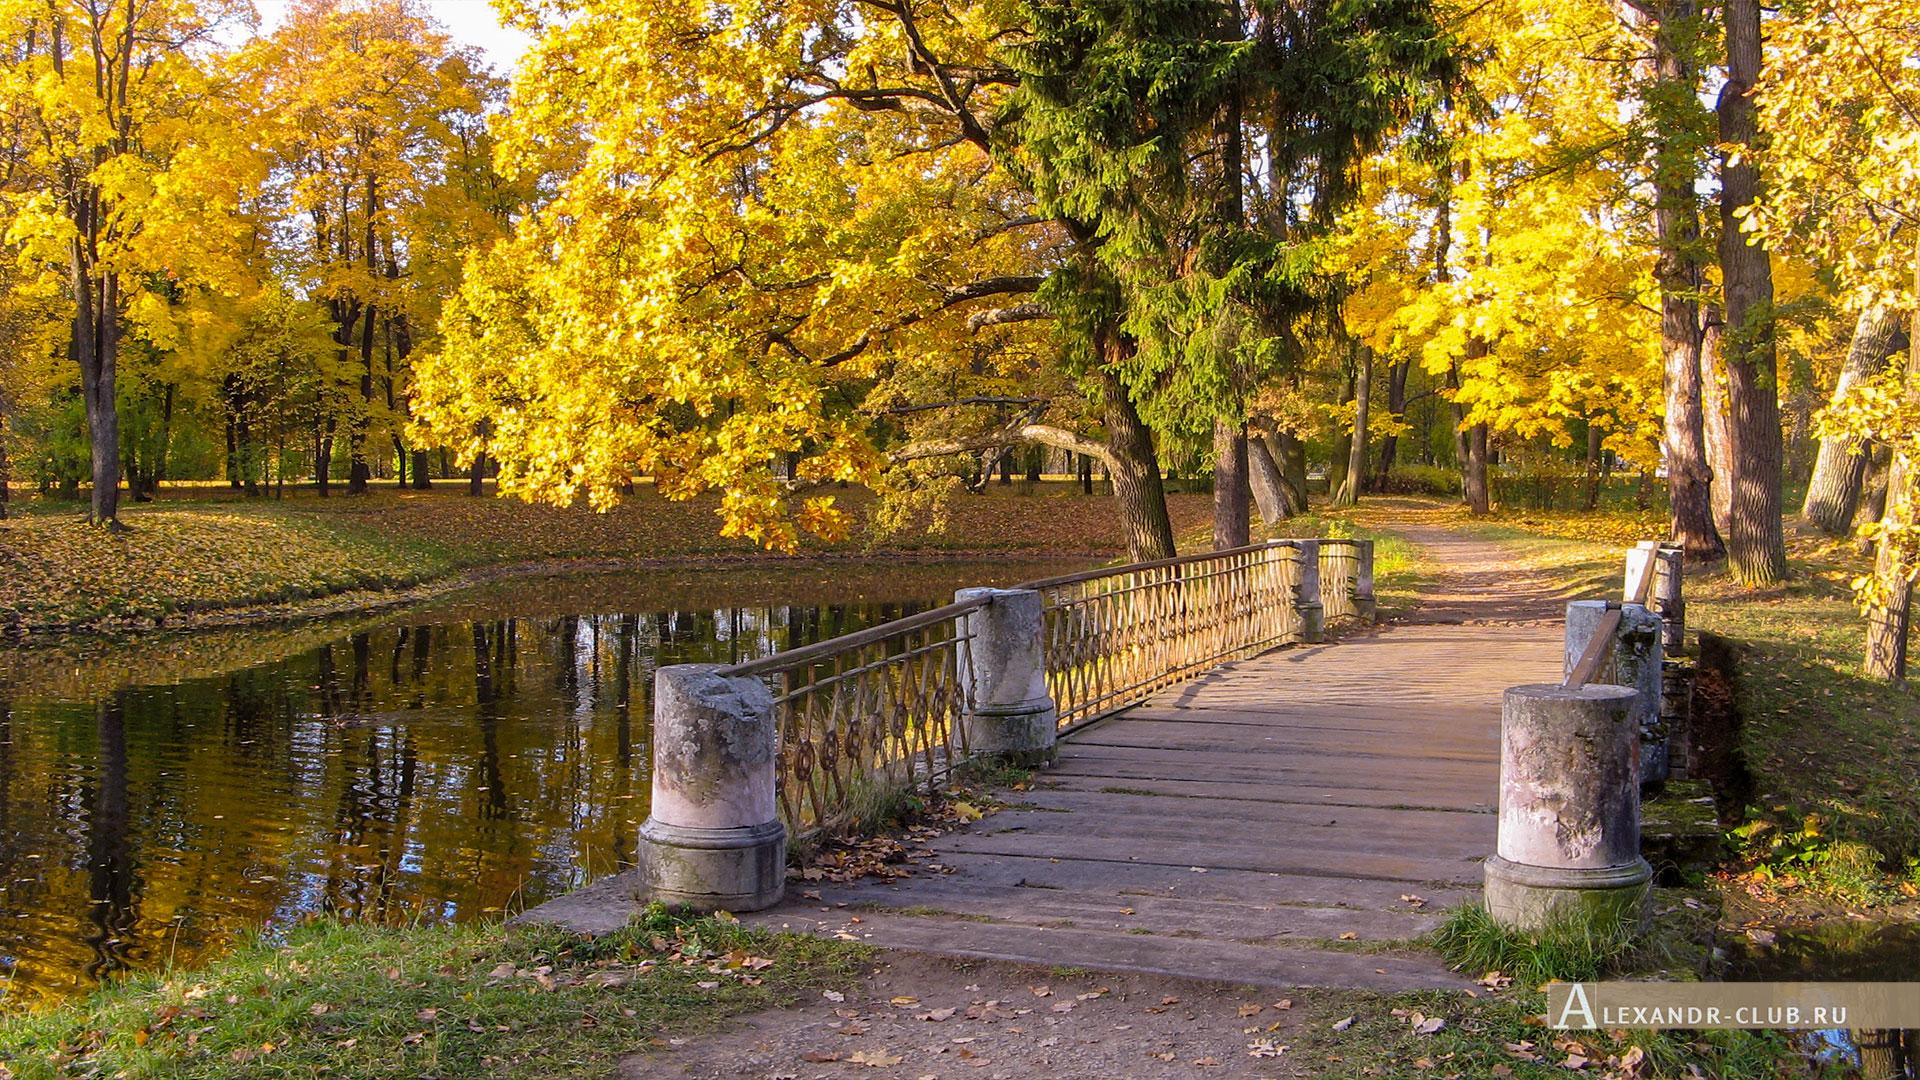 Пушкин, Царское Село, осень, Александровский парк, Прудки, мост